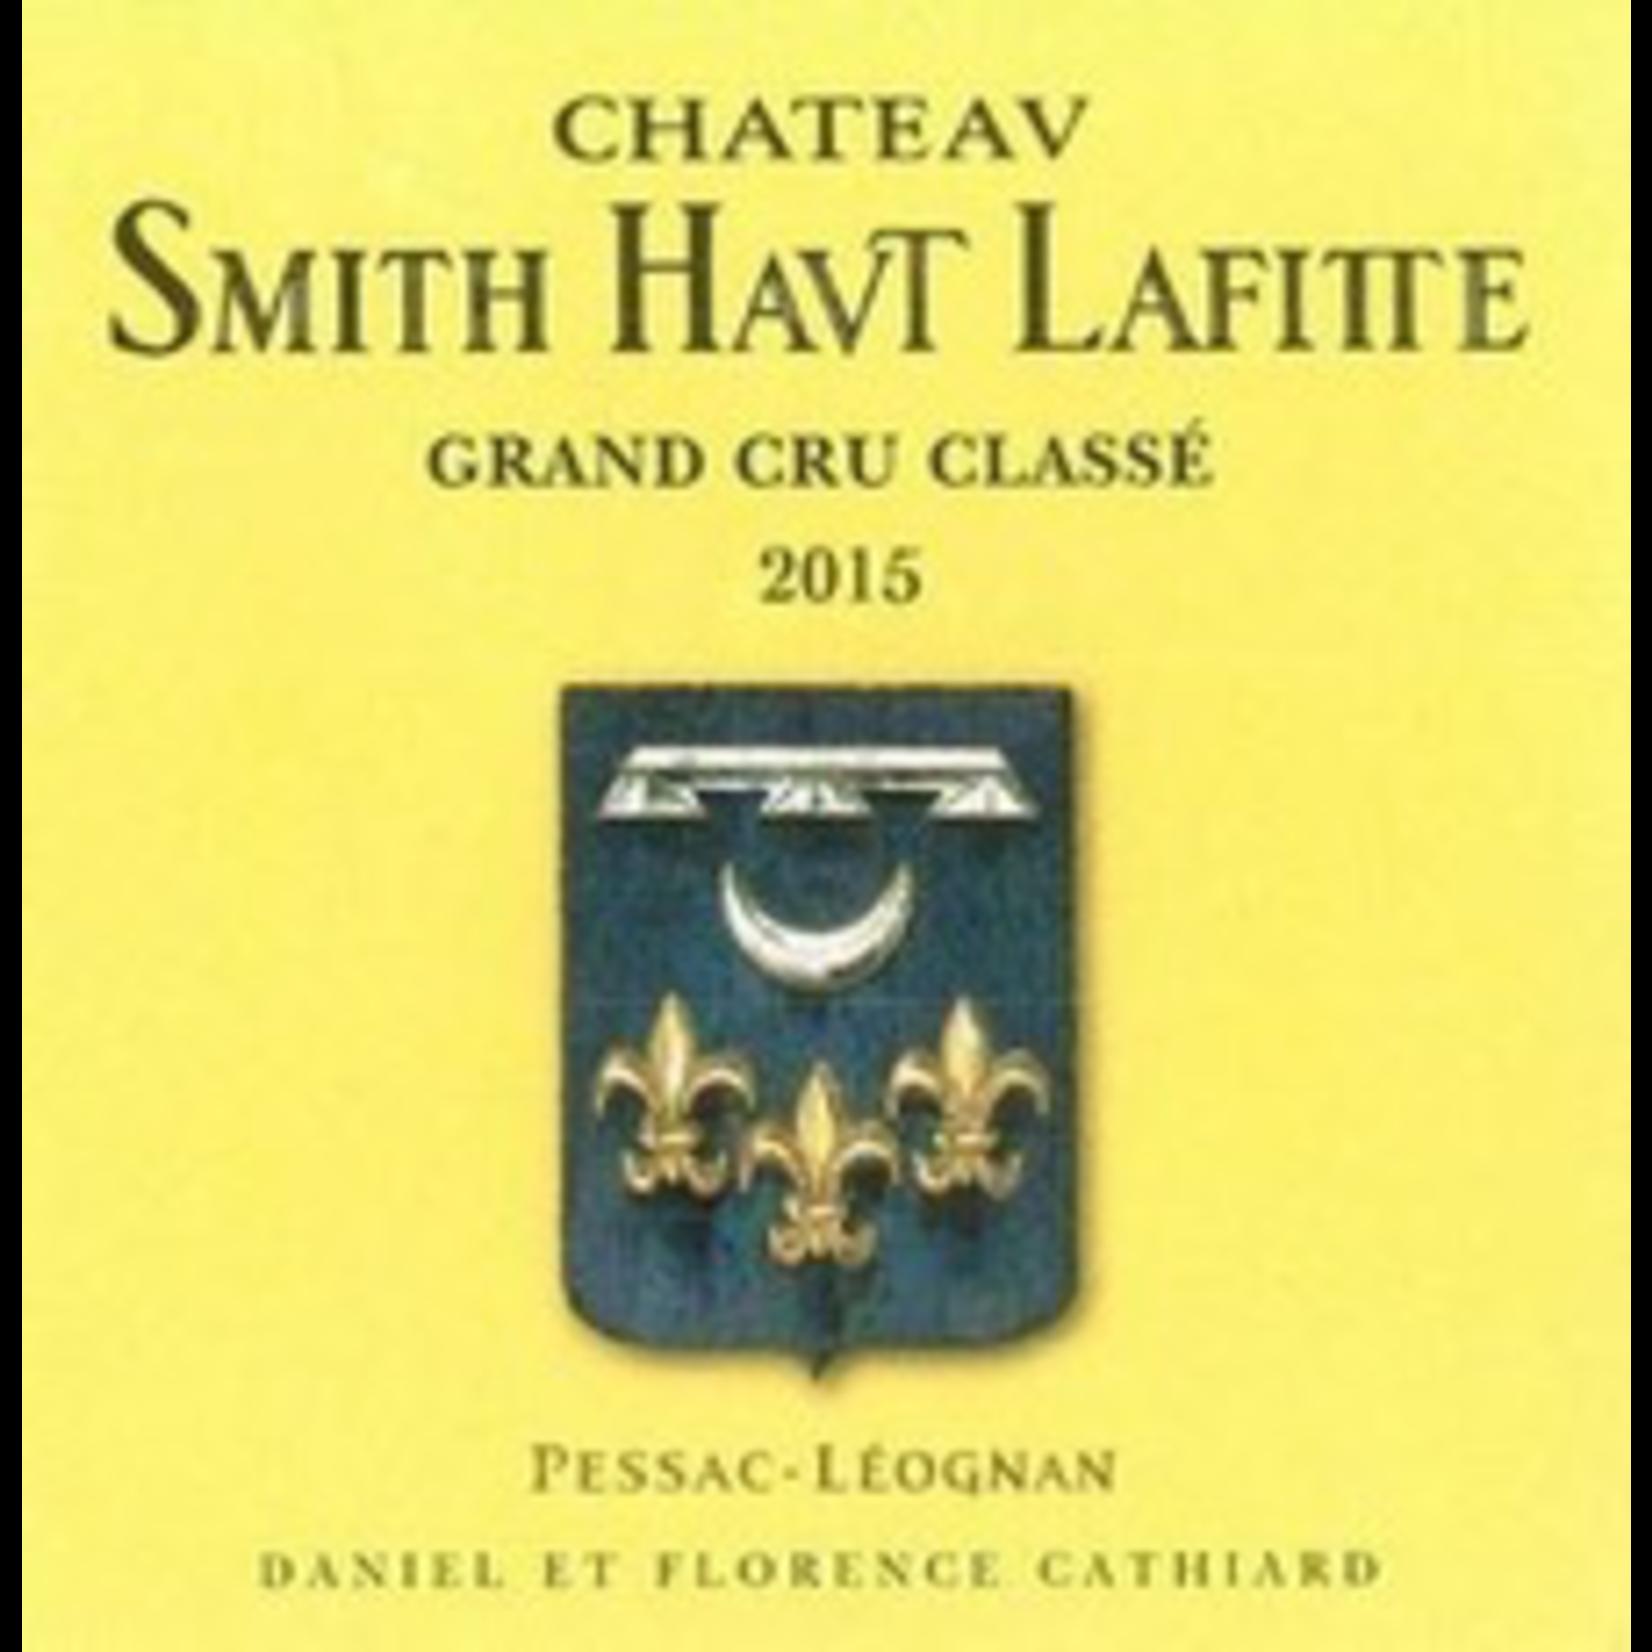 Chateau Smith Haut Lafitte 2015